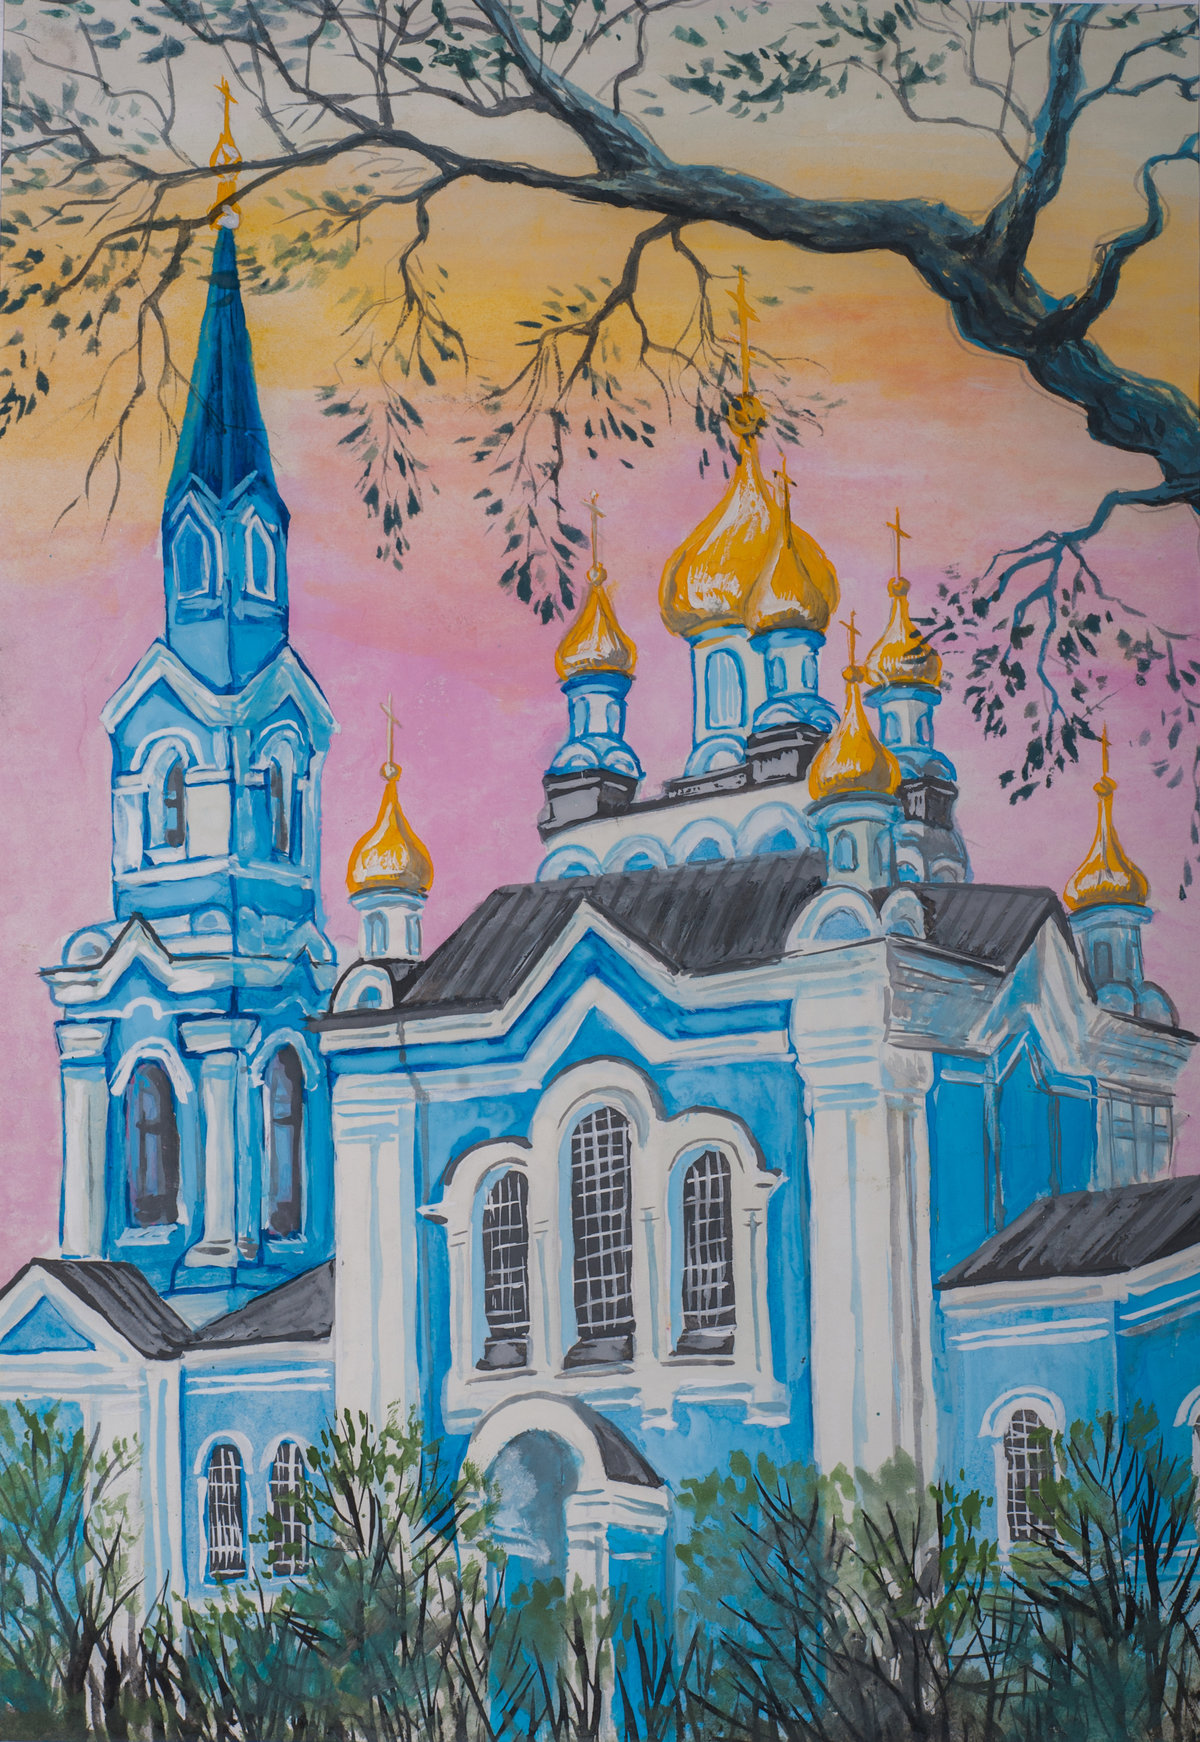 Для, картинки церквей и храмов для срисовки